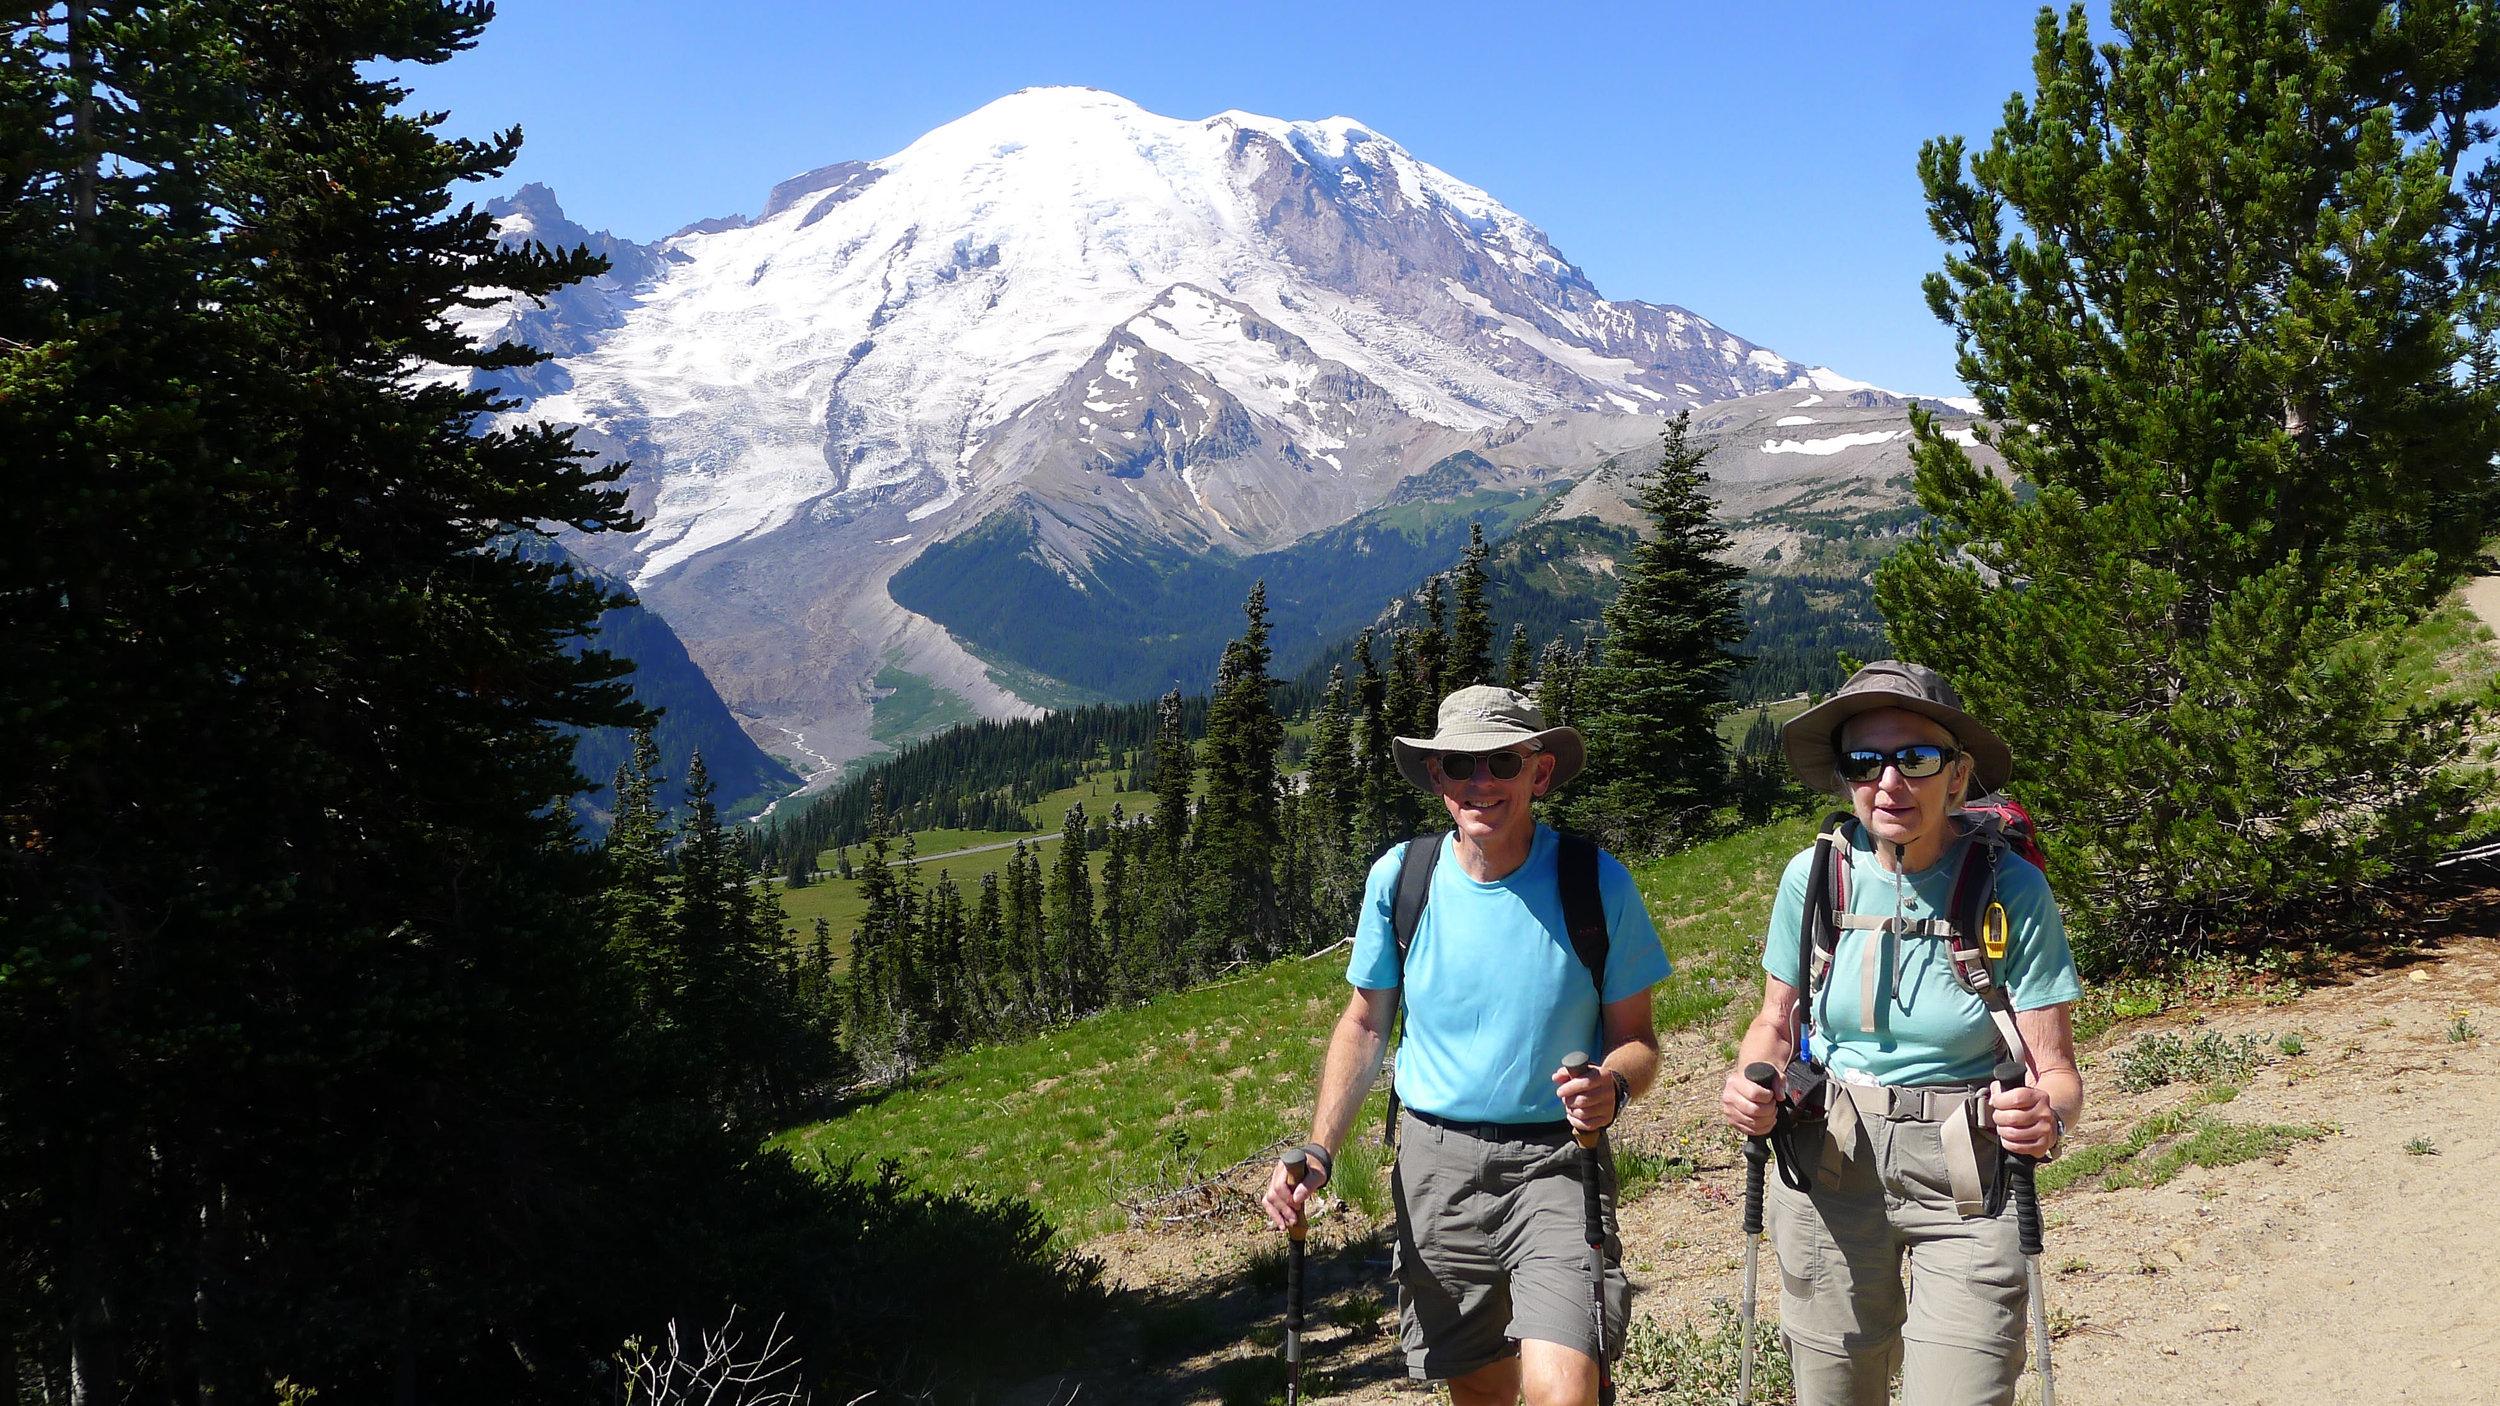 A Day Hike On Mt. Rainier (Washington)